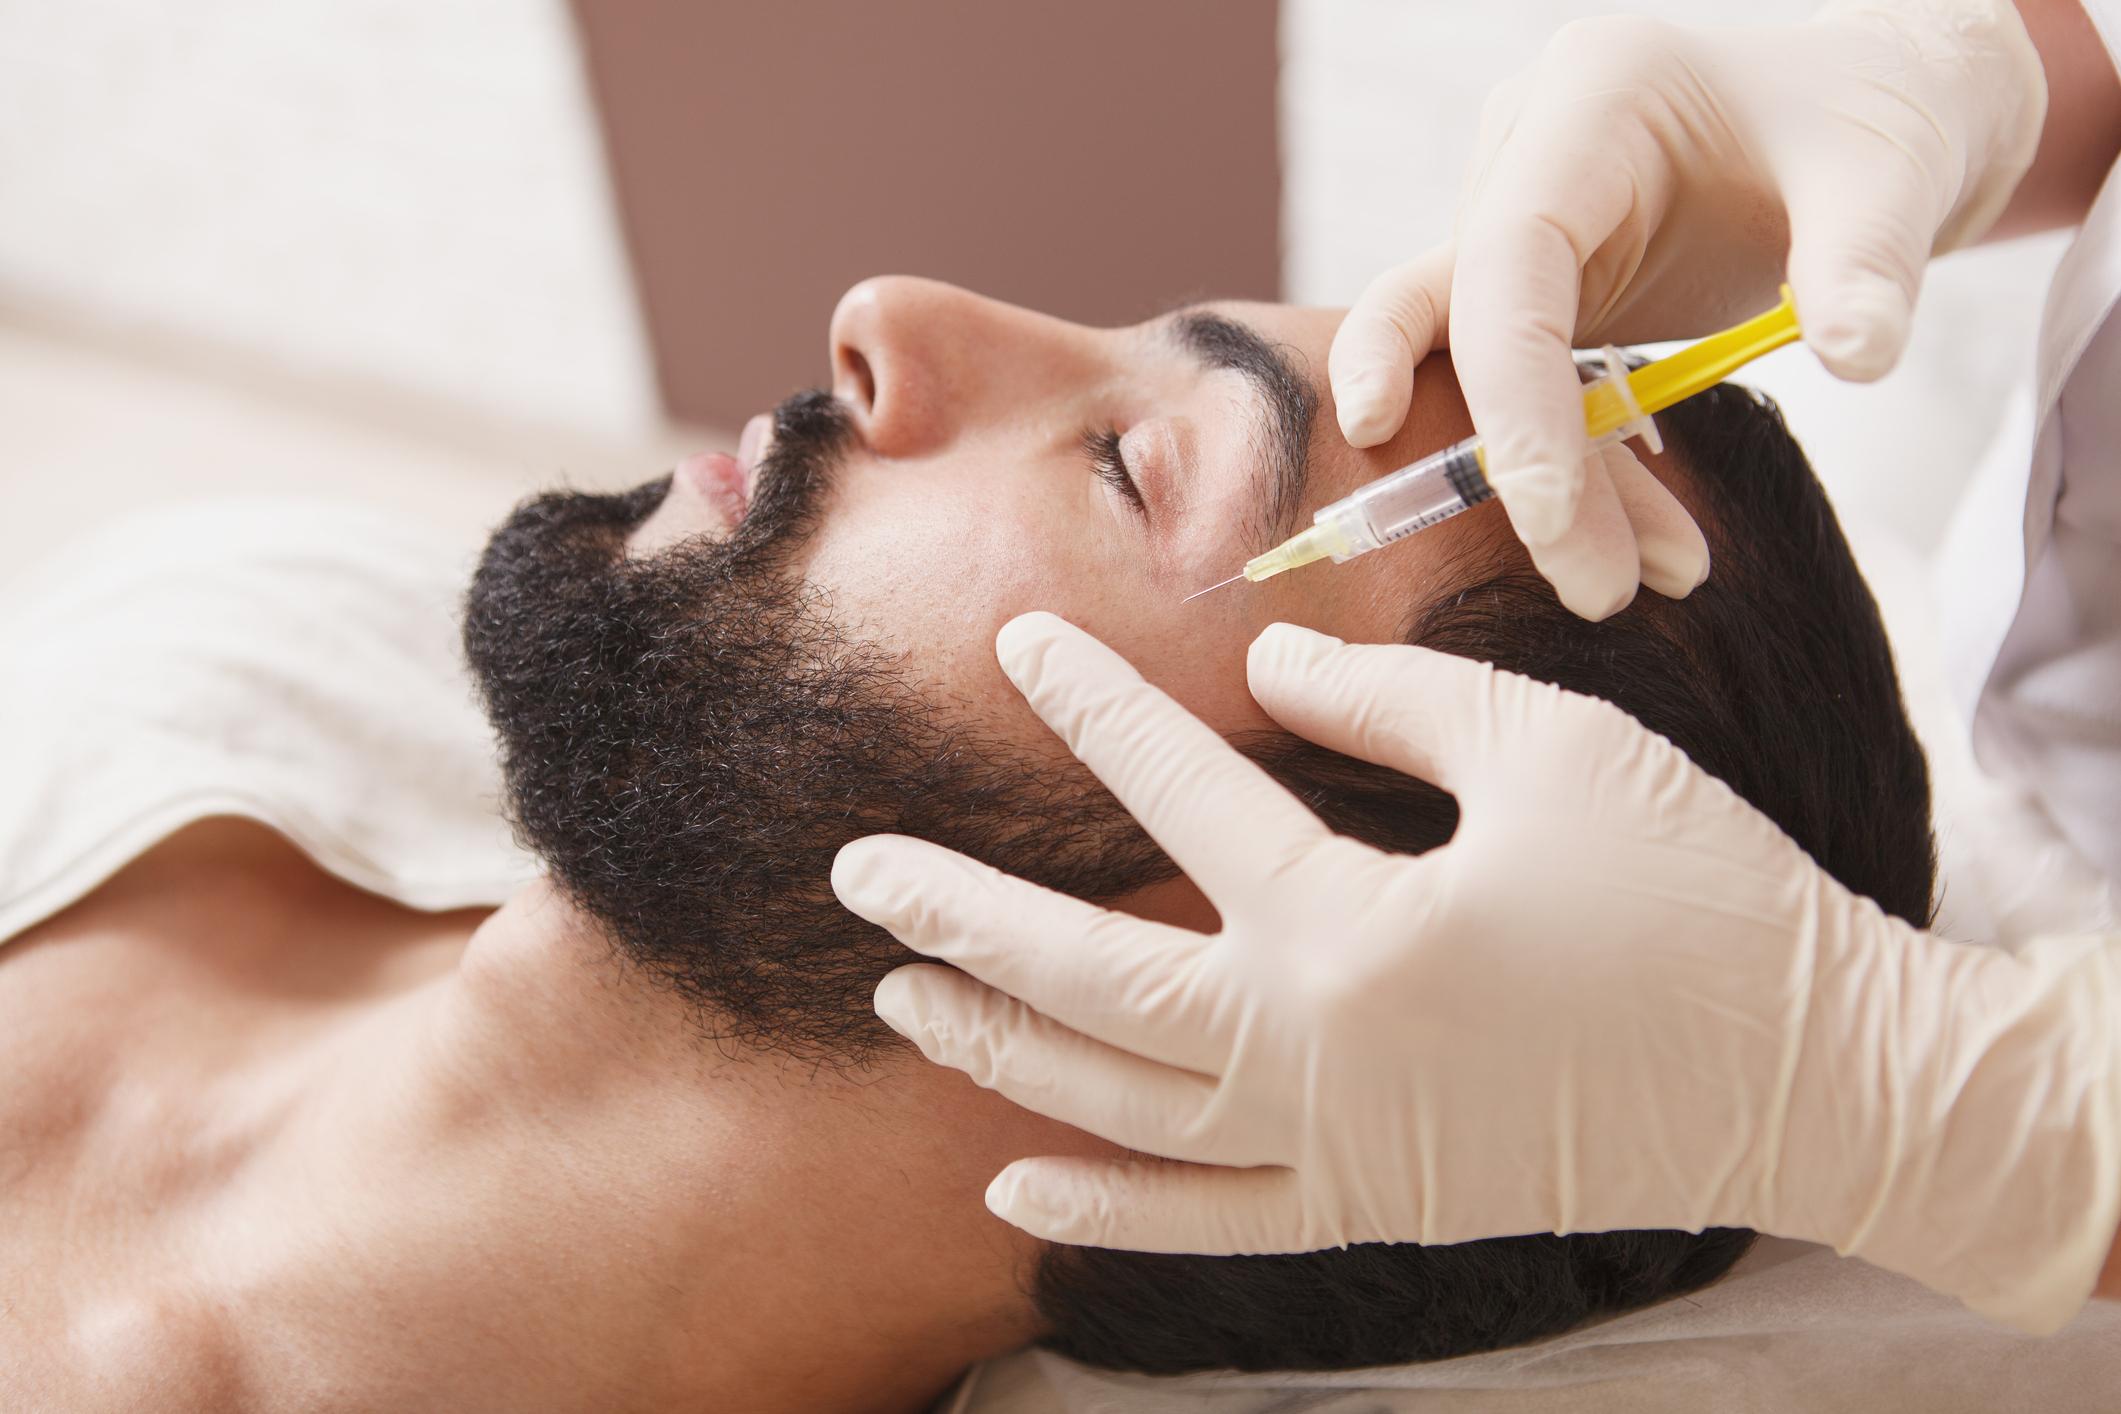 The Maercks Institute Blog | Popular Male Enhancement Procedures